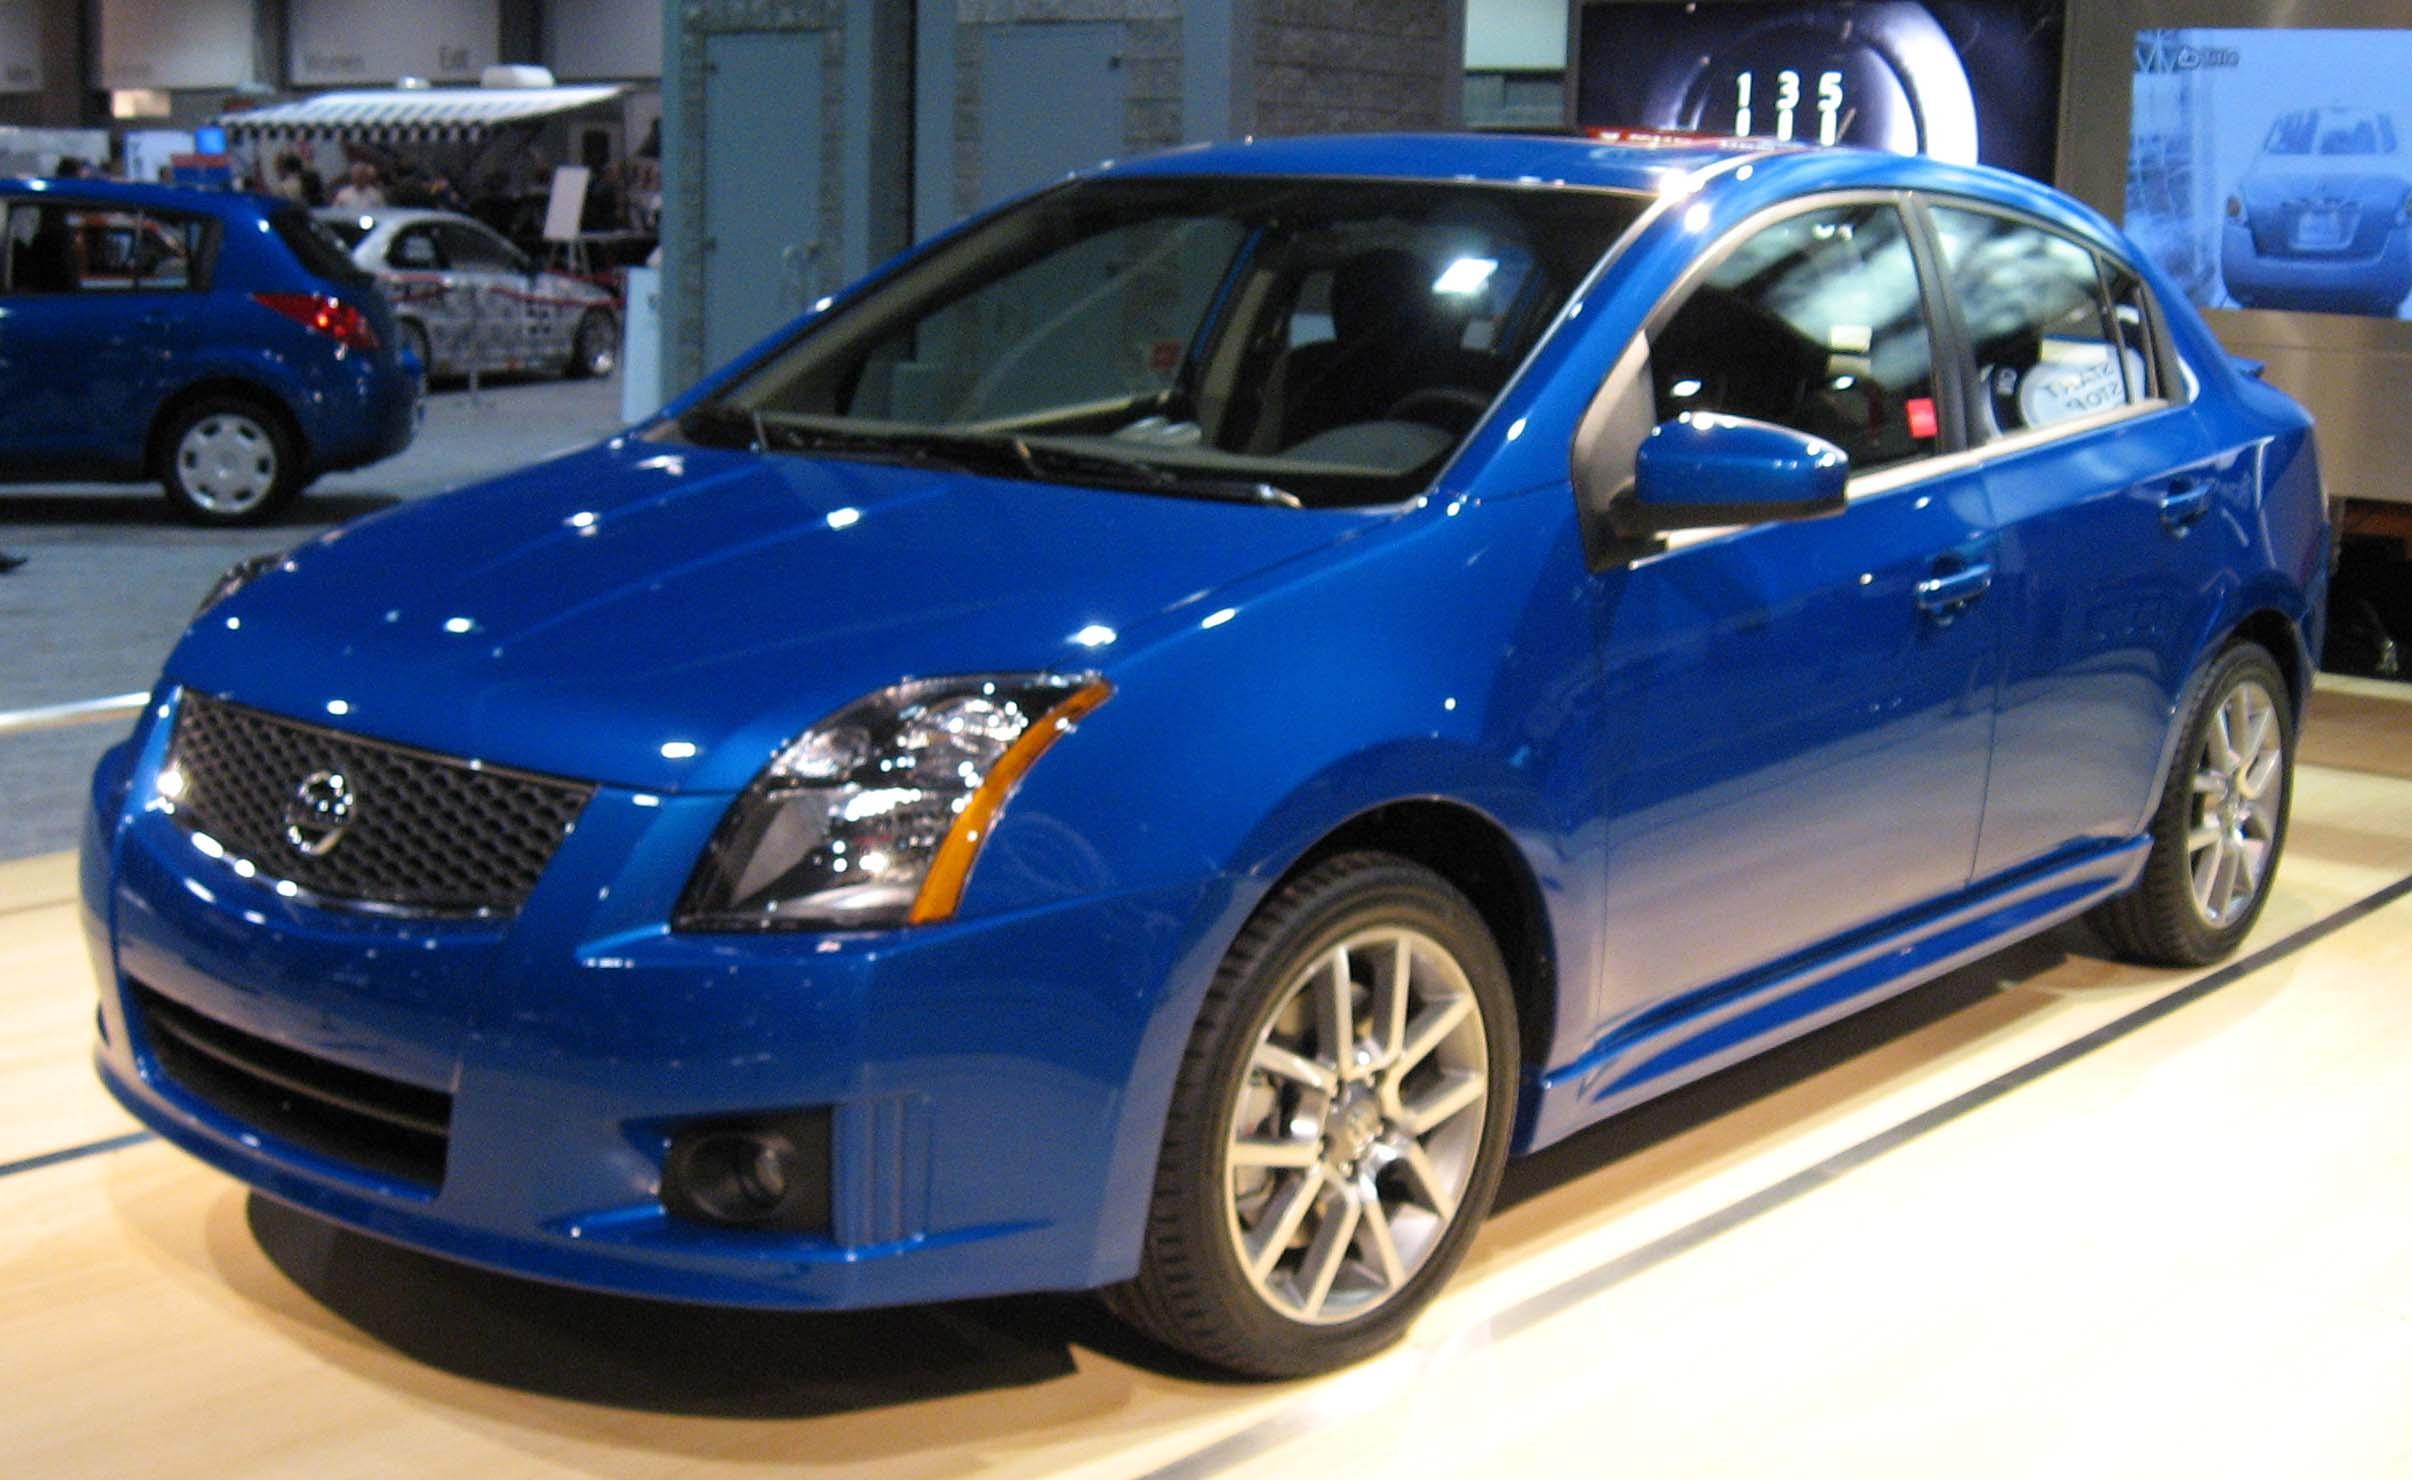 NISSAN CARS GALLERY: Nissan Sentra